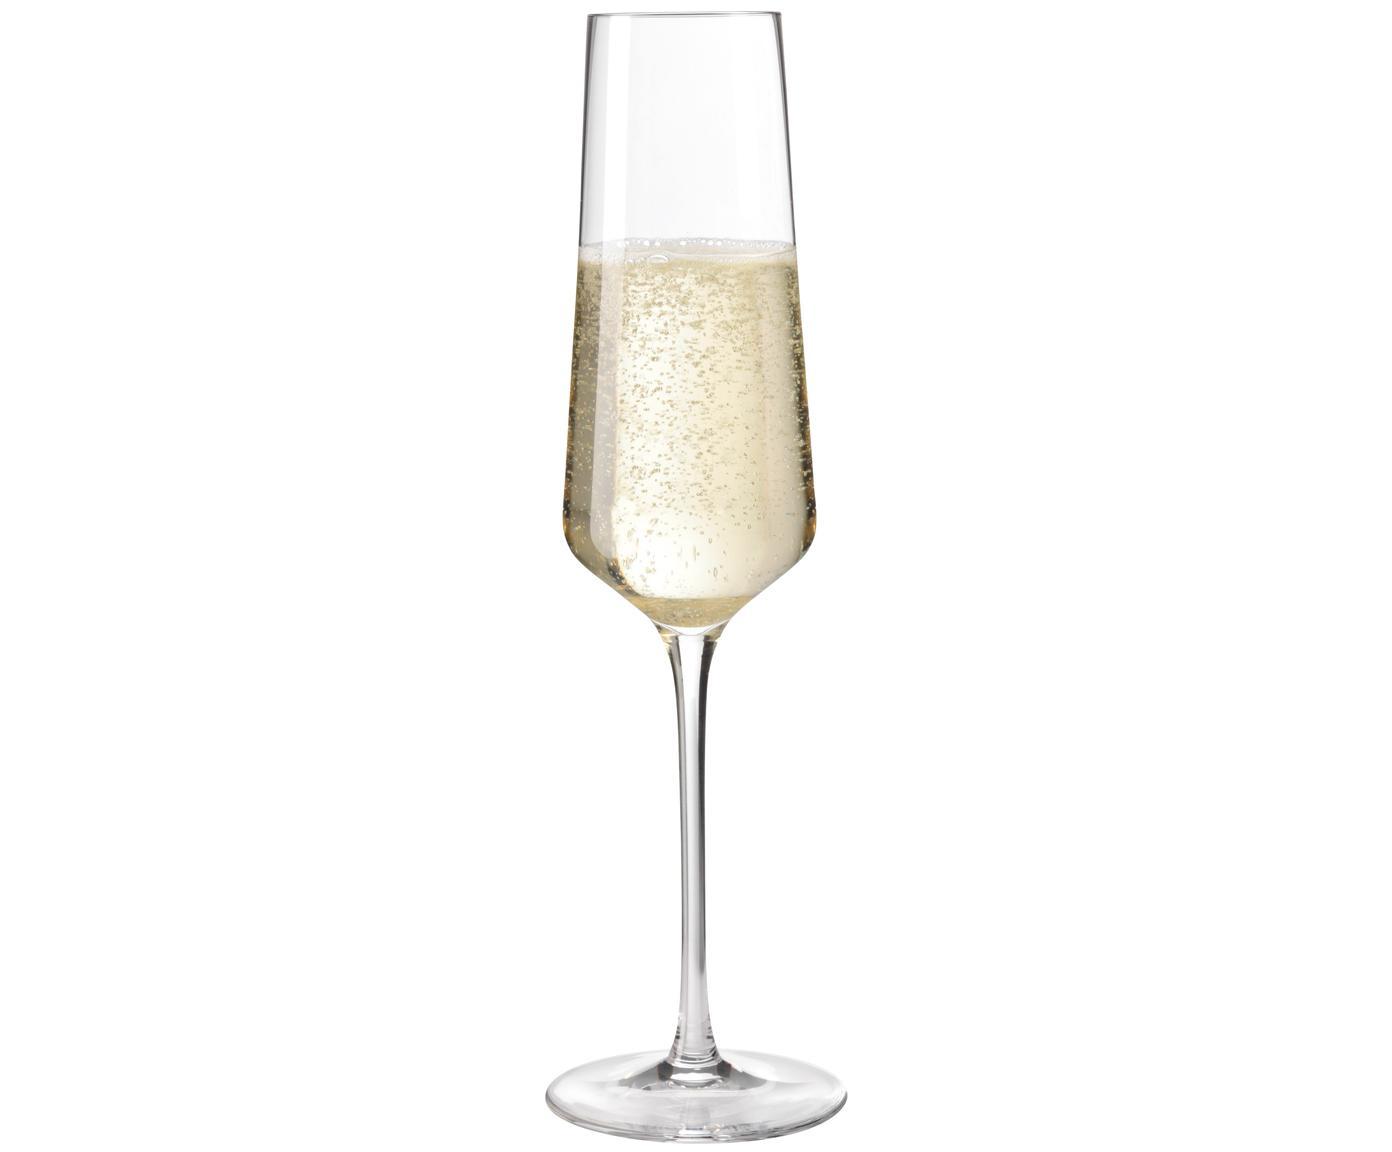 Champagneglas Puccini, 6 stuks, Teqton® glas, Transparant, Ø 7 x H 26 cm